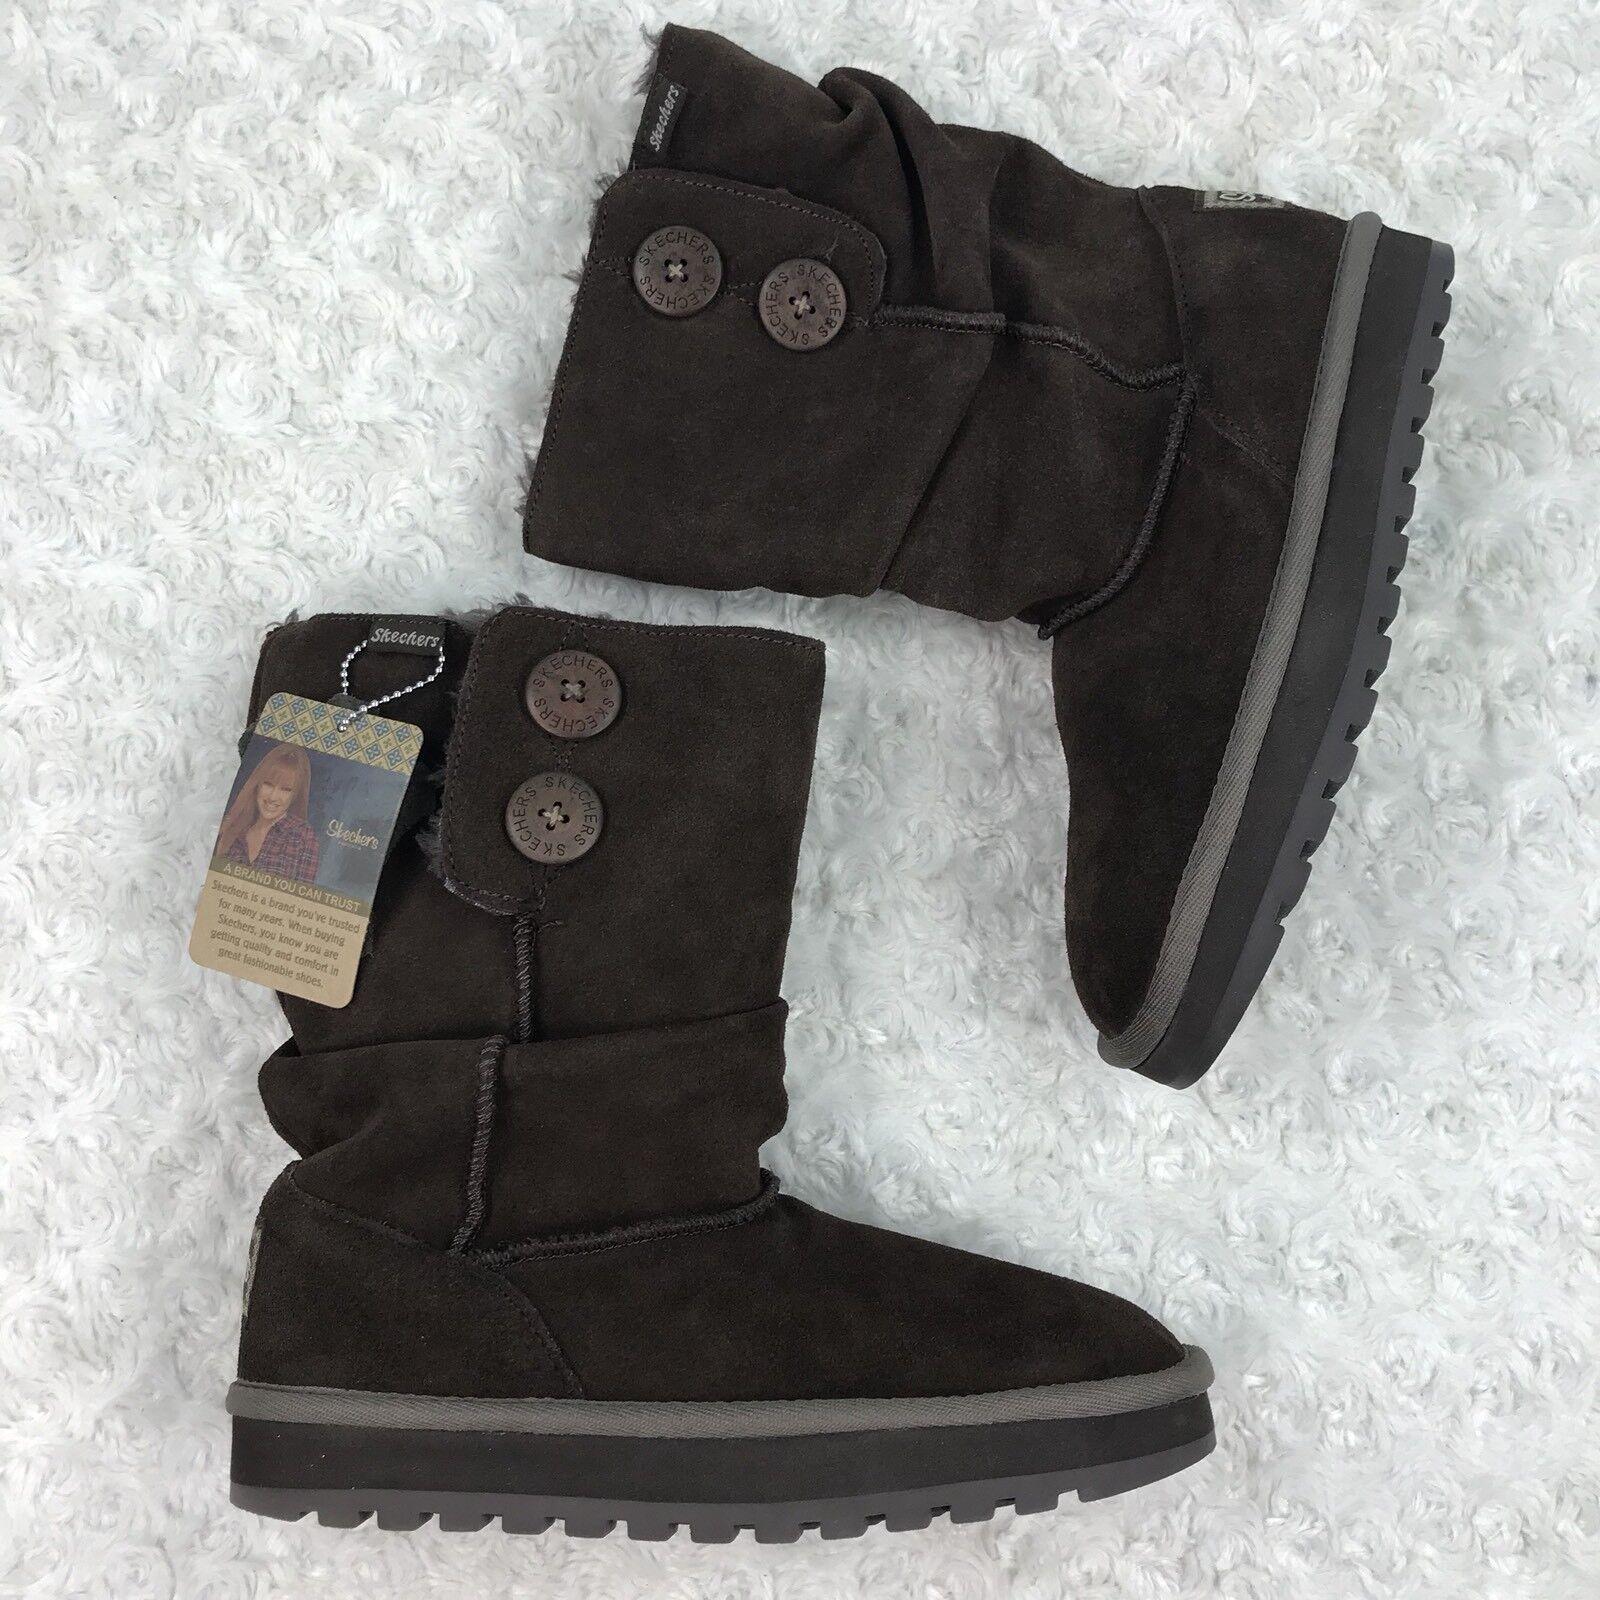 skechers Australia Women's Boots Size 6 UK 3 Mid-Calf Chocolate Suede Keepsakes